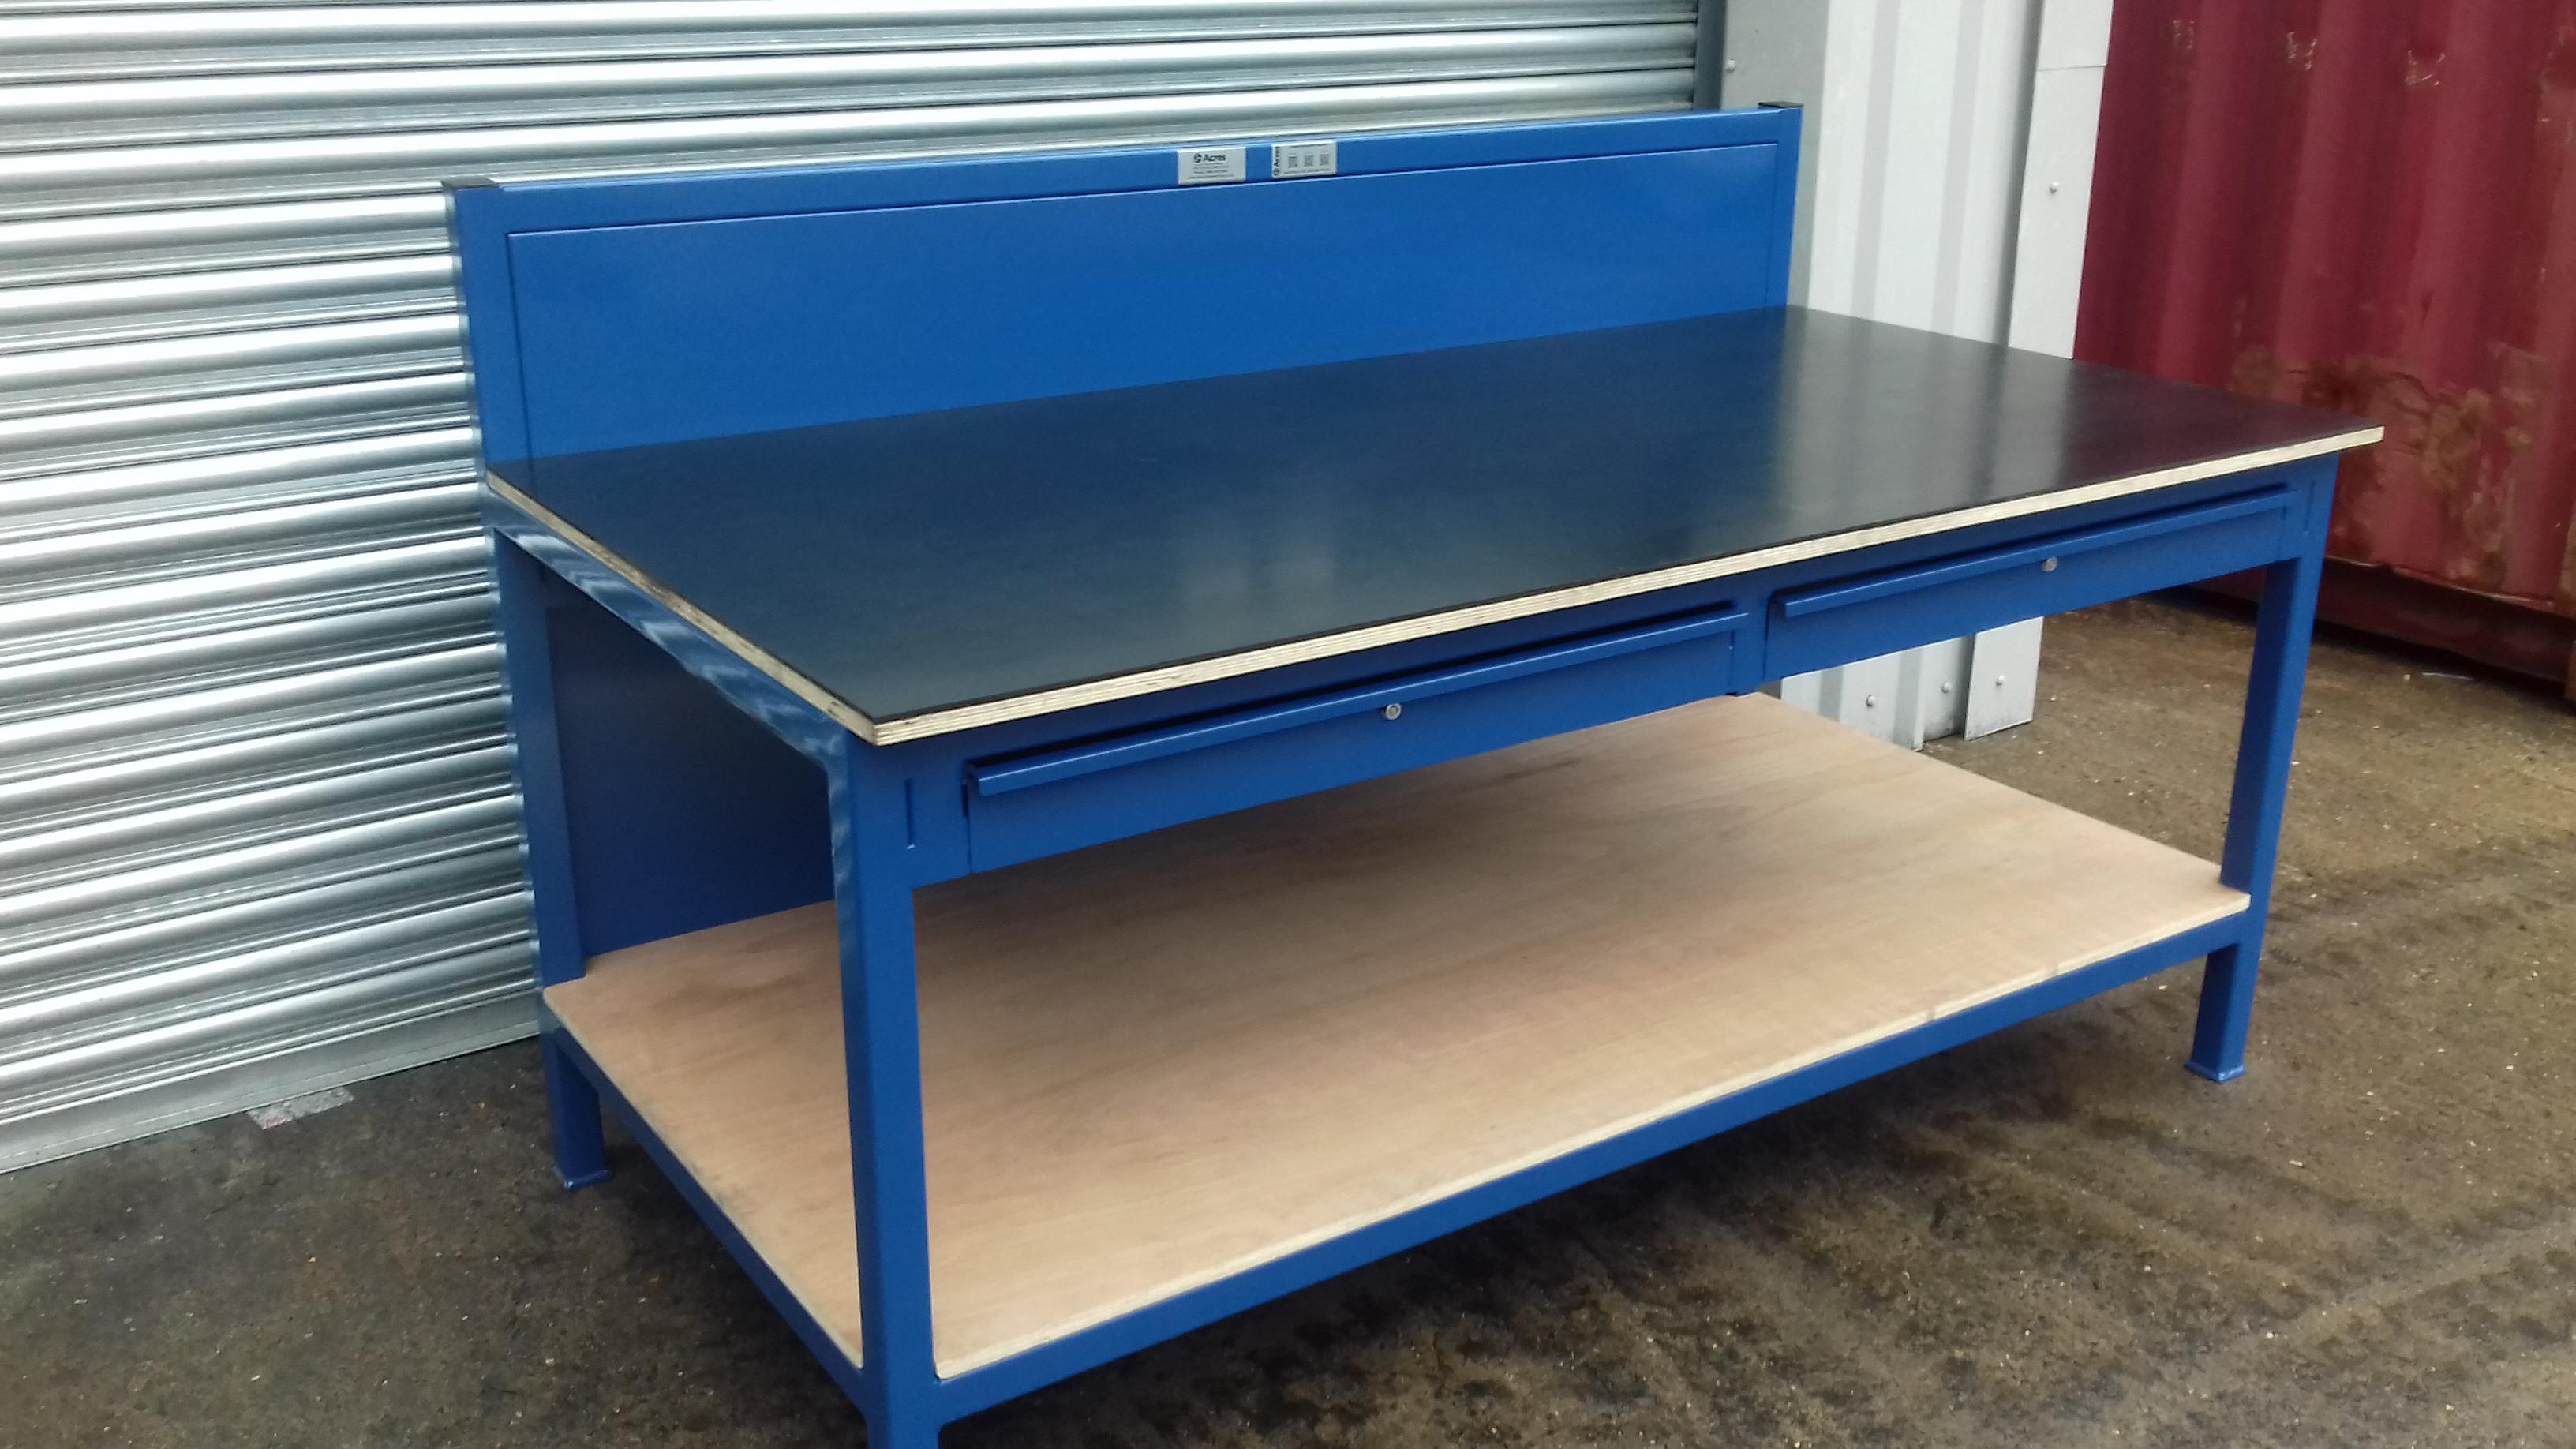 Assembly Inspection Bench